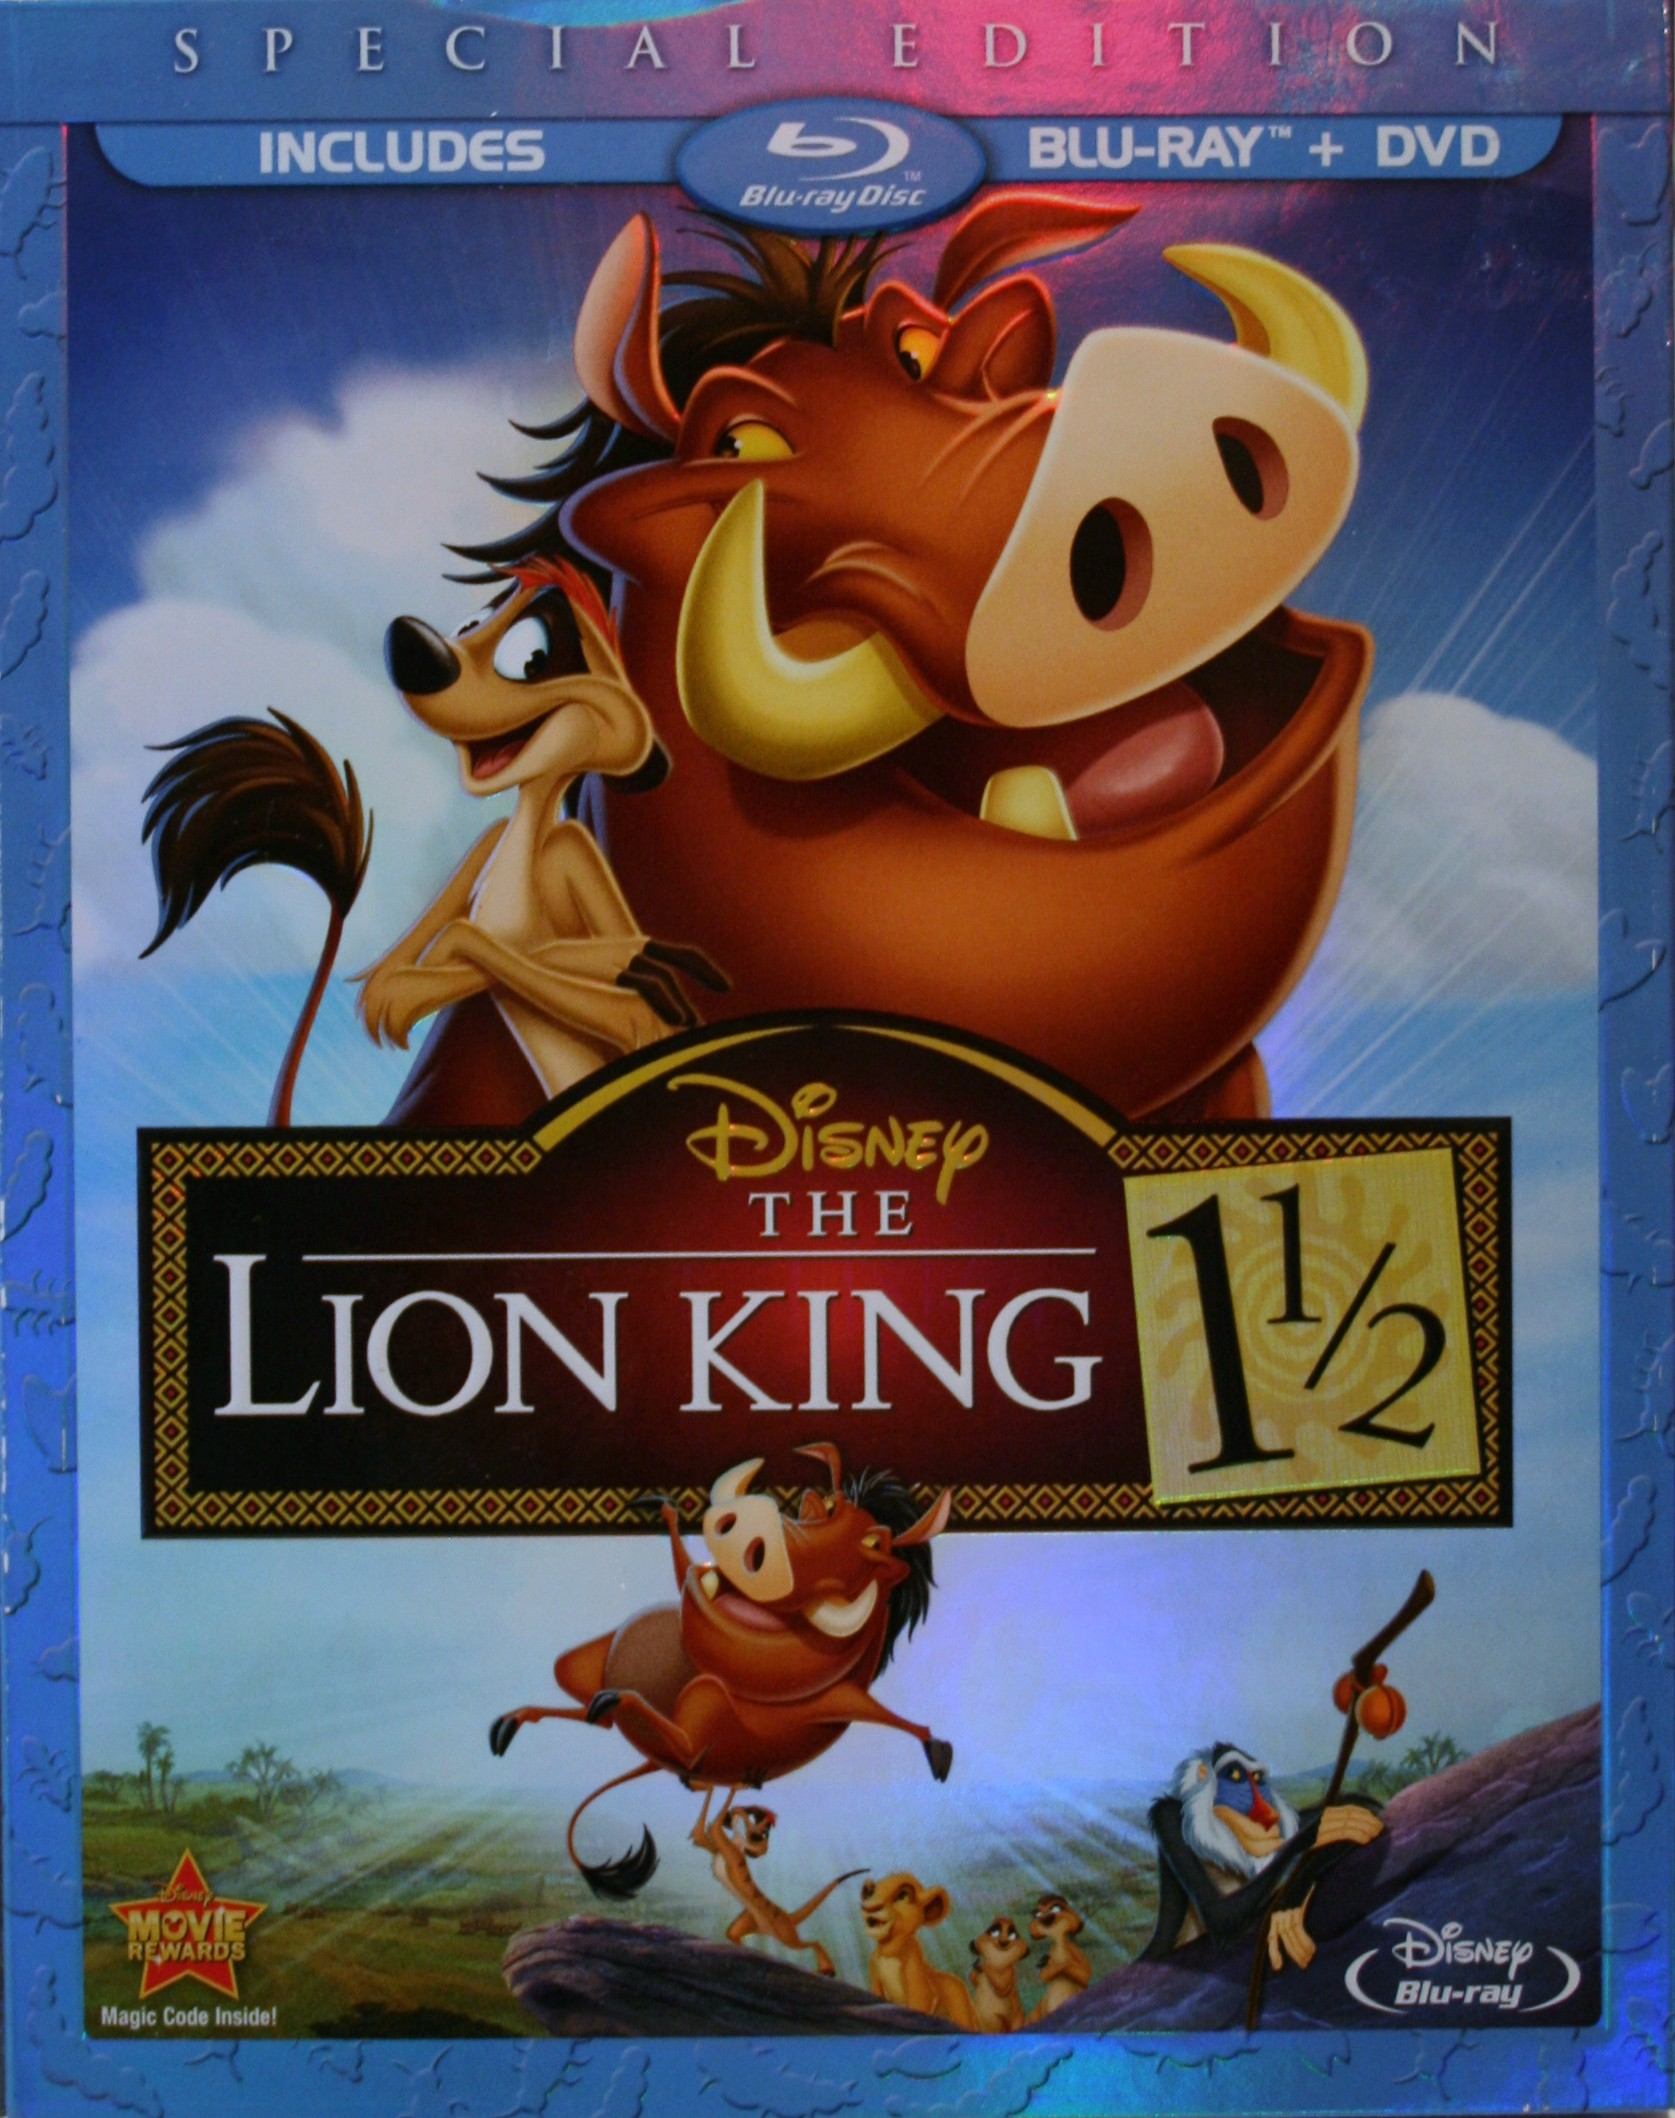 lion king 1 1 2 extras review disney dispatch